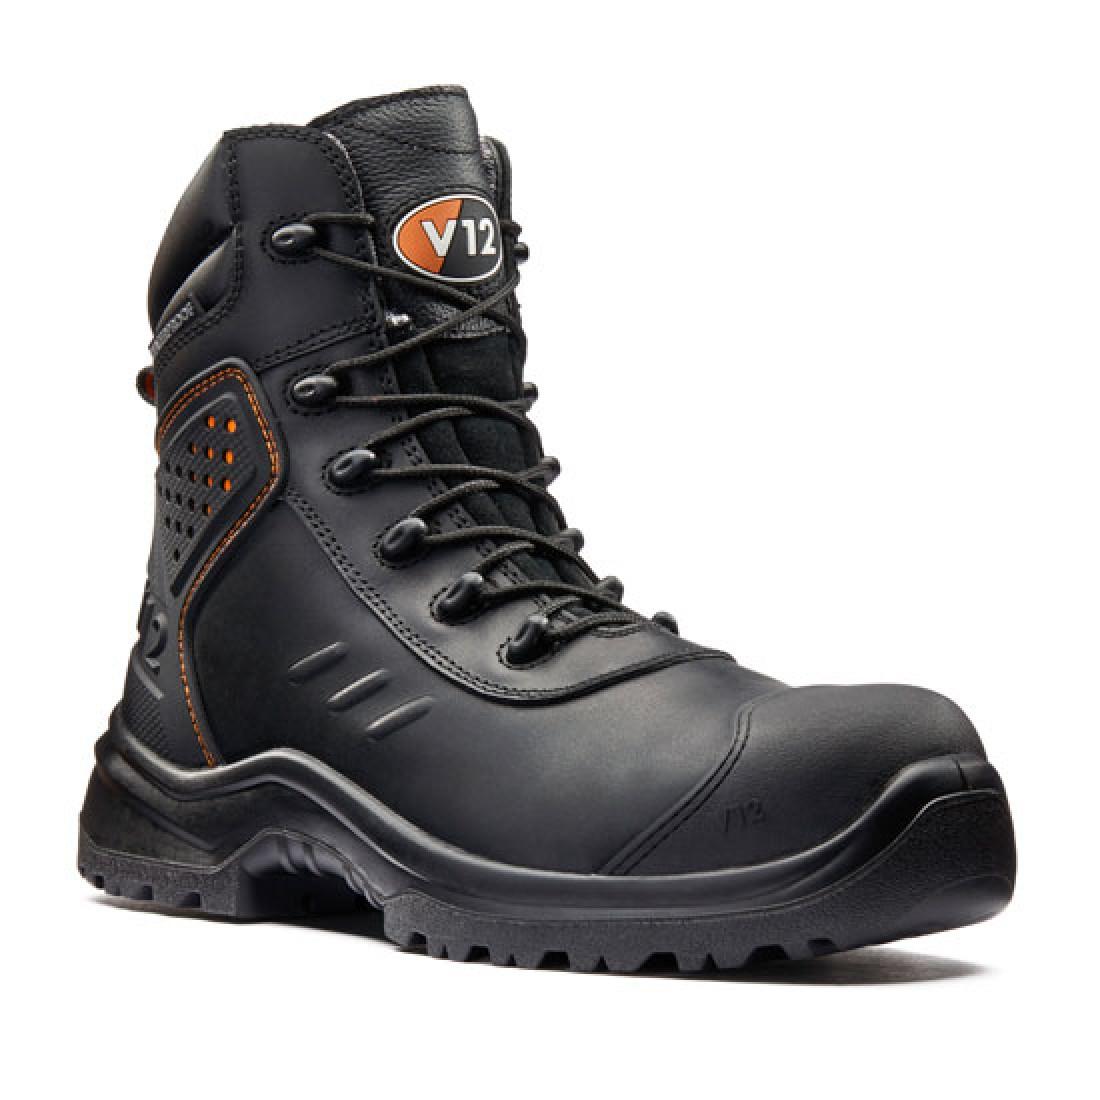 V12 Defender STS Men Safety Combat Boots Waterproof Metal Free